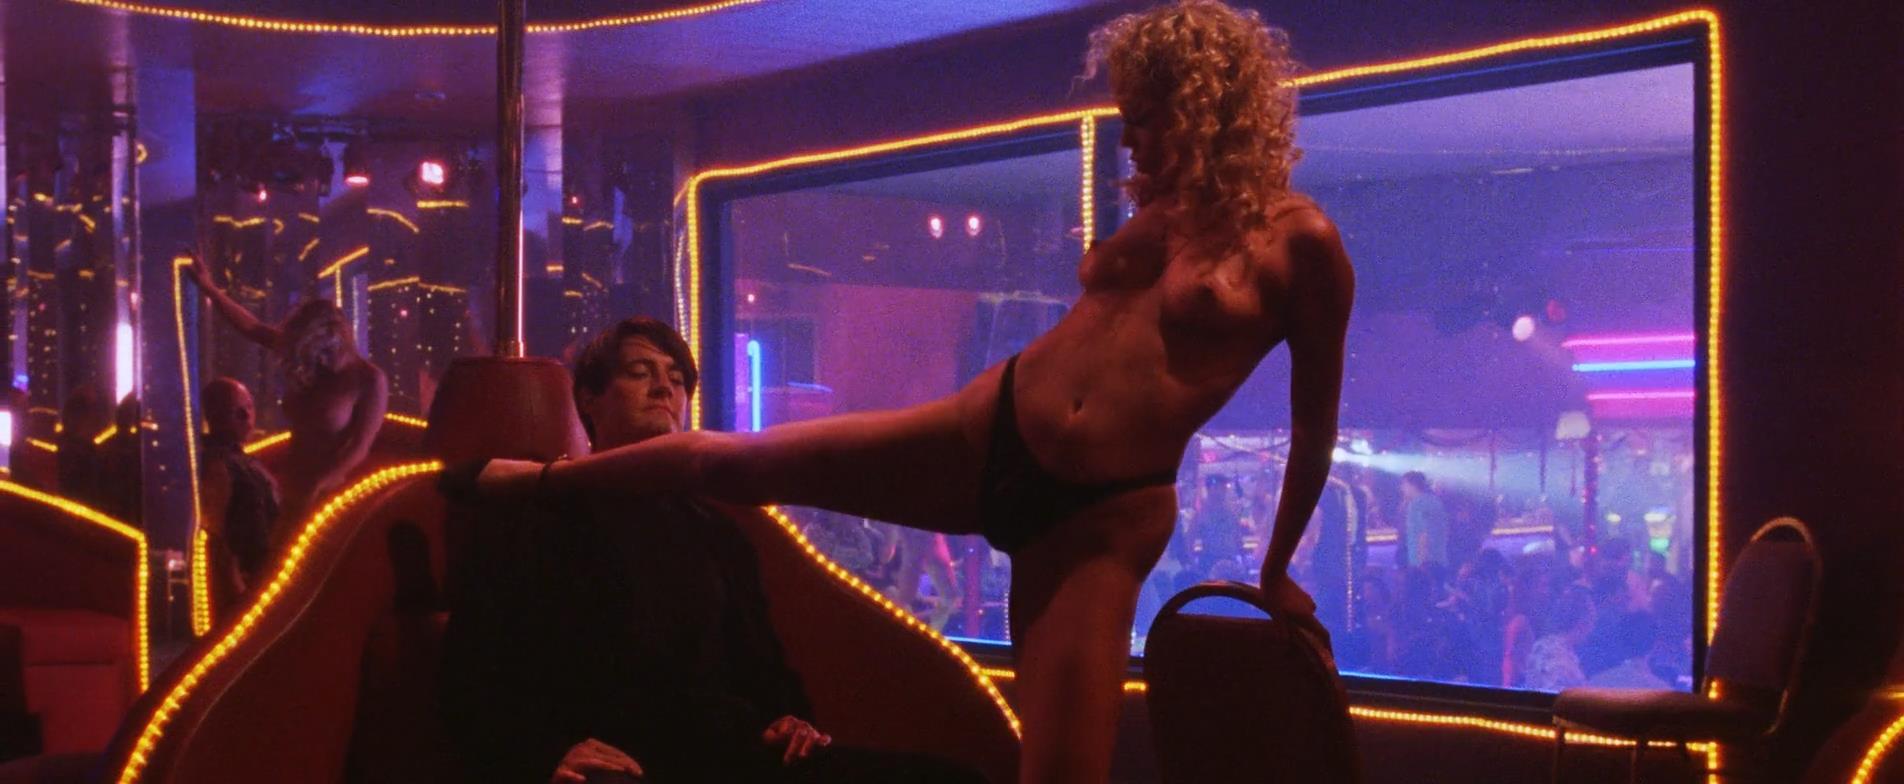 Elizabeth-Berkley-nude-full-frontal-sex-Showgirls-1995-hd1080p3.jpg